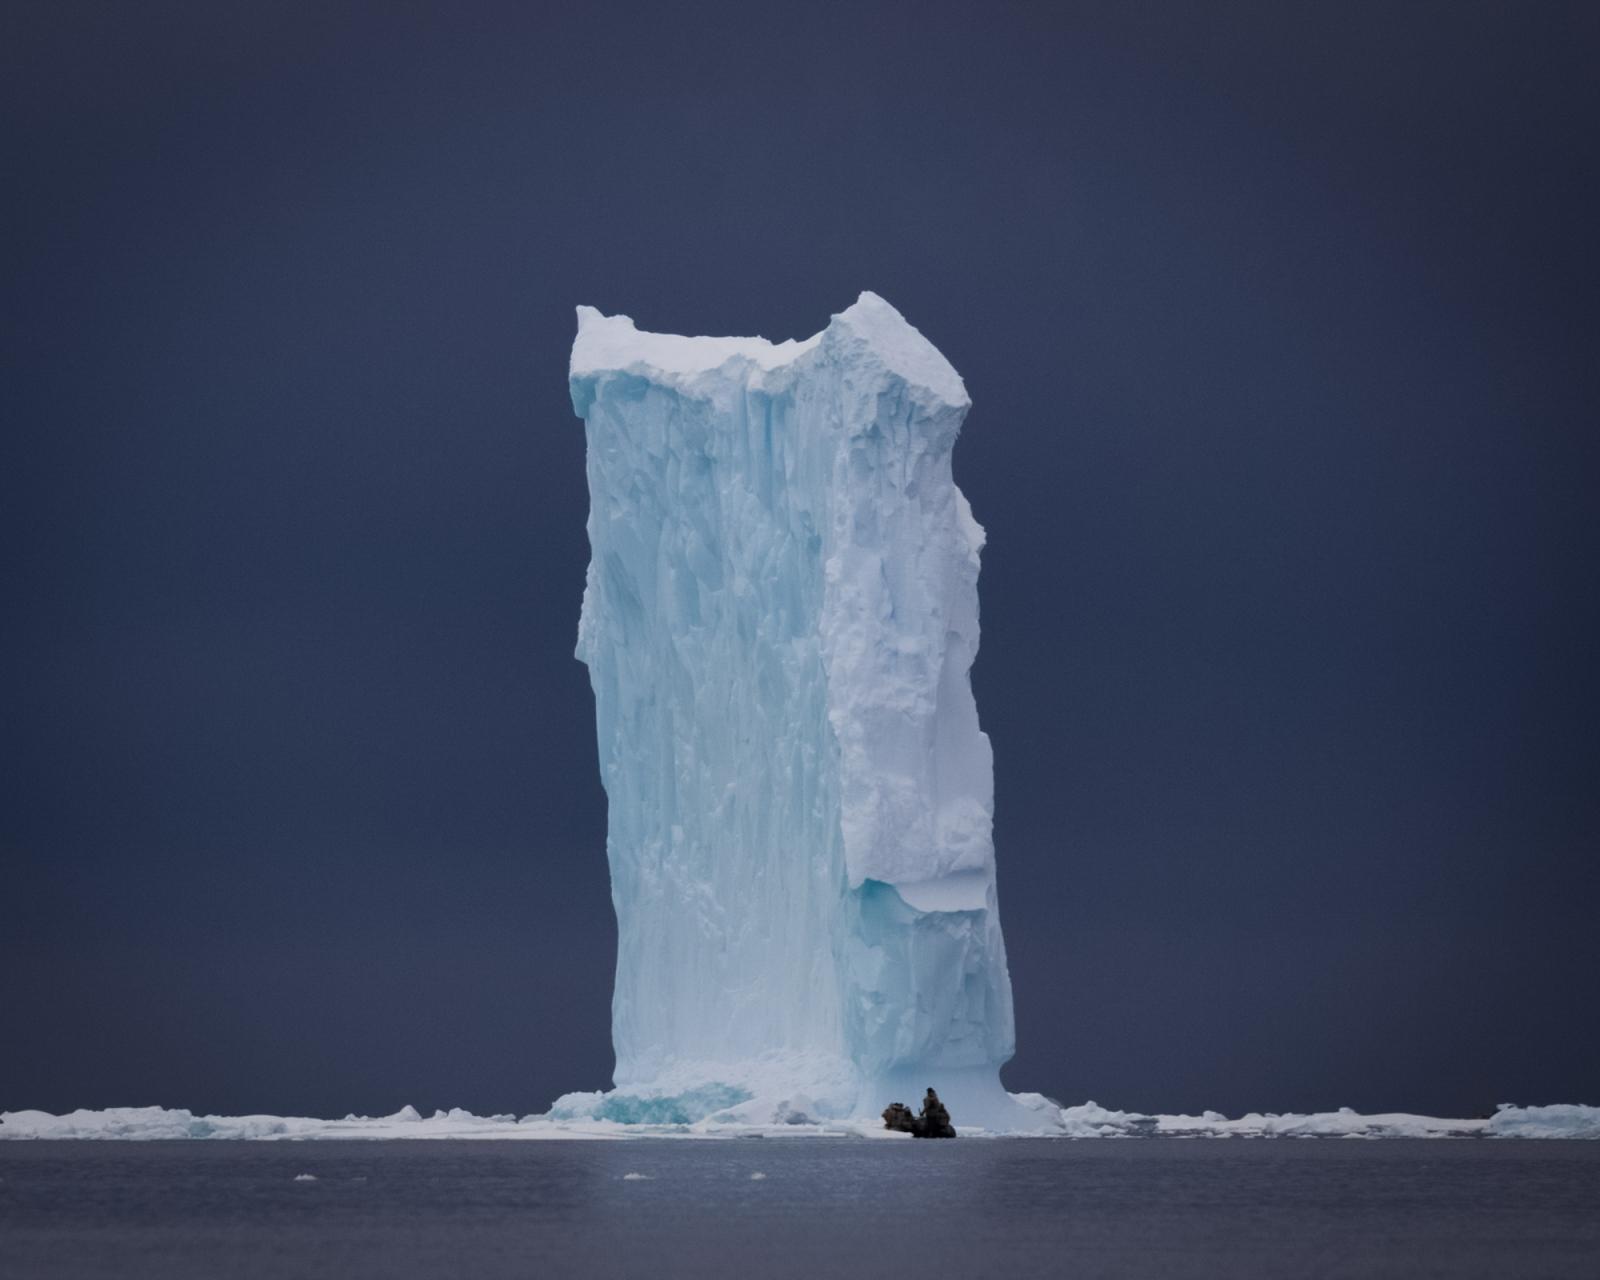 Iceberg in Wilhelmina Bay, Antarctica.